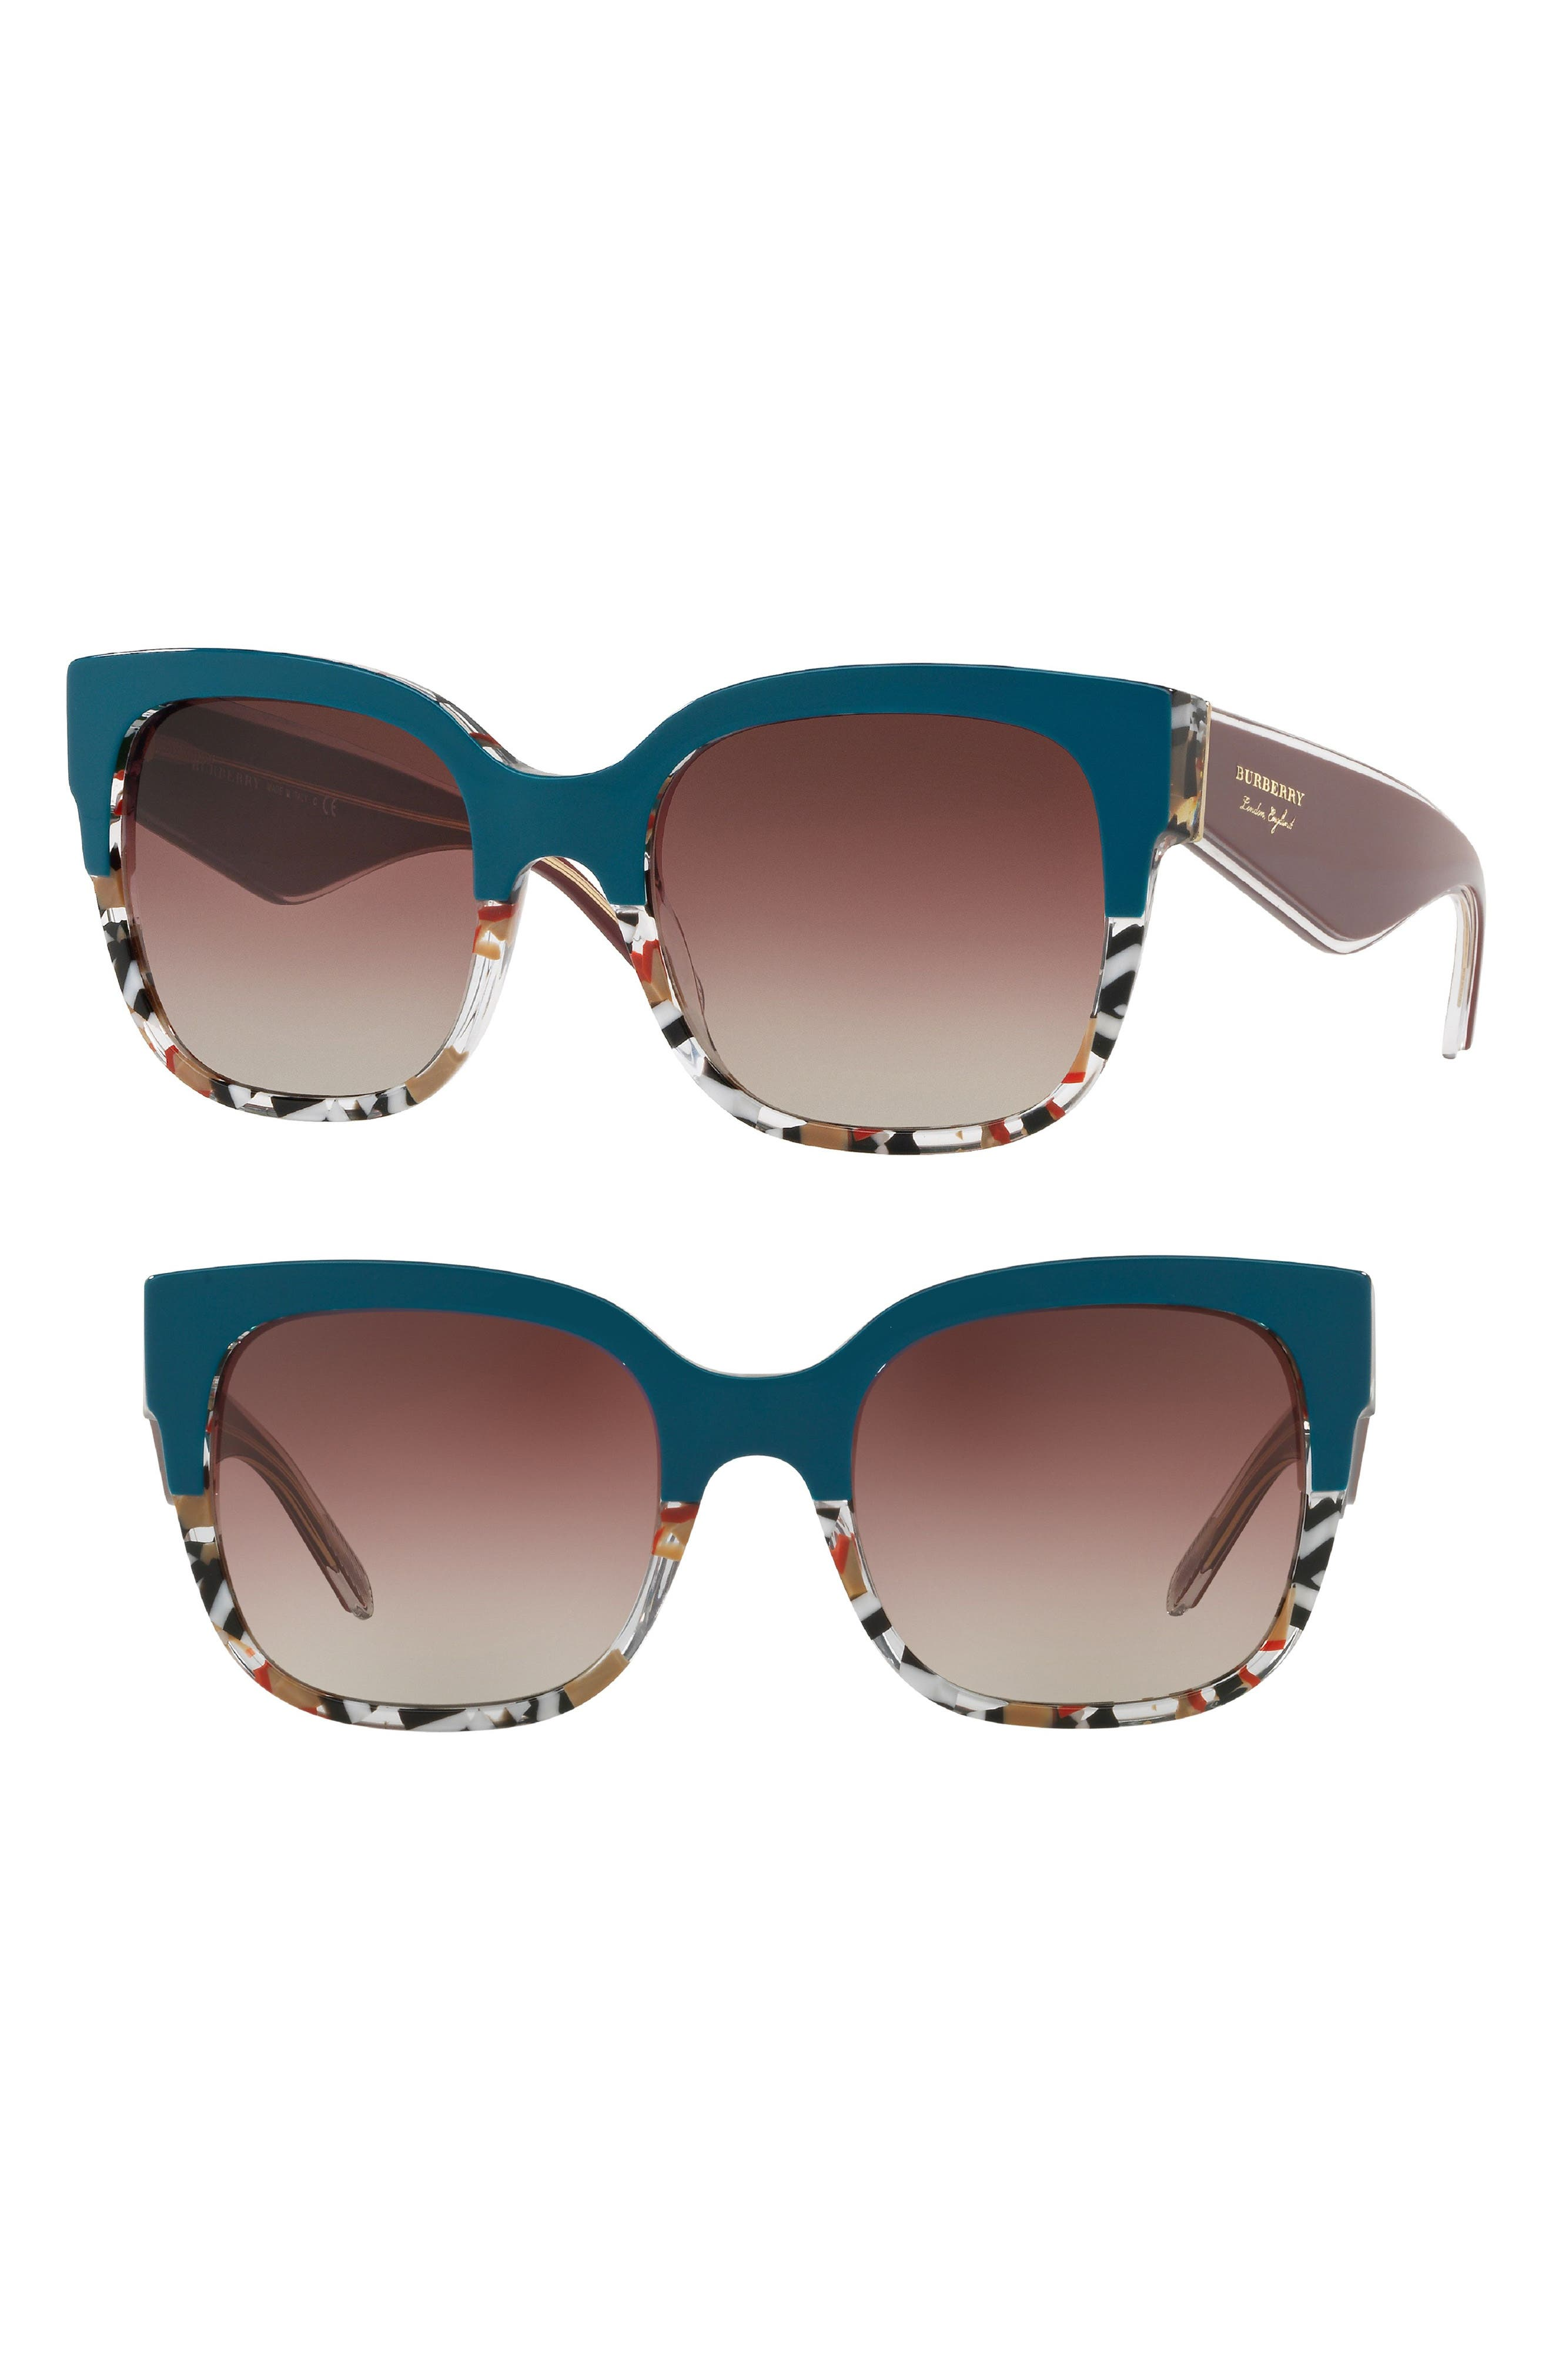 56mm Cat Eye Sunglasses,                             Main thumbnail 1, color,                             DARK GREEN GRADIENT